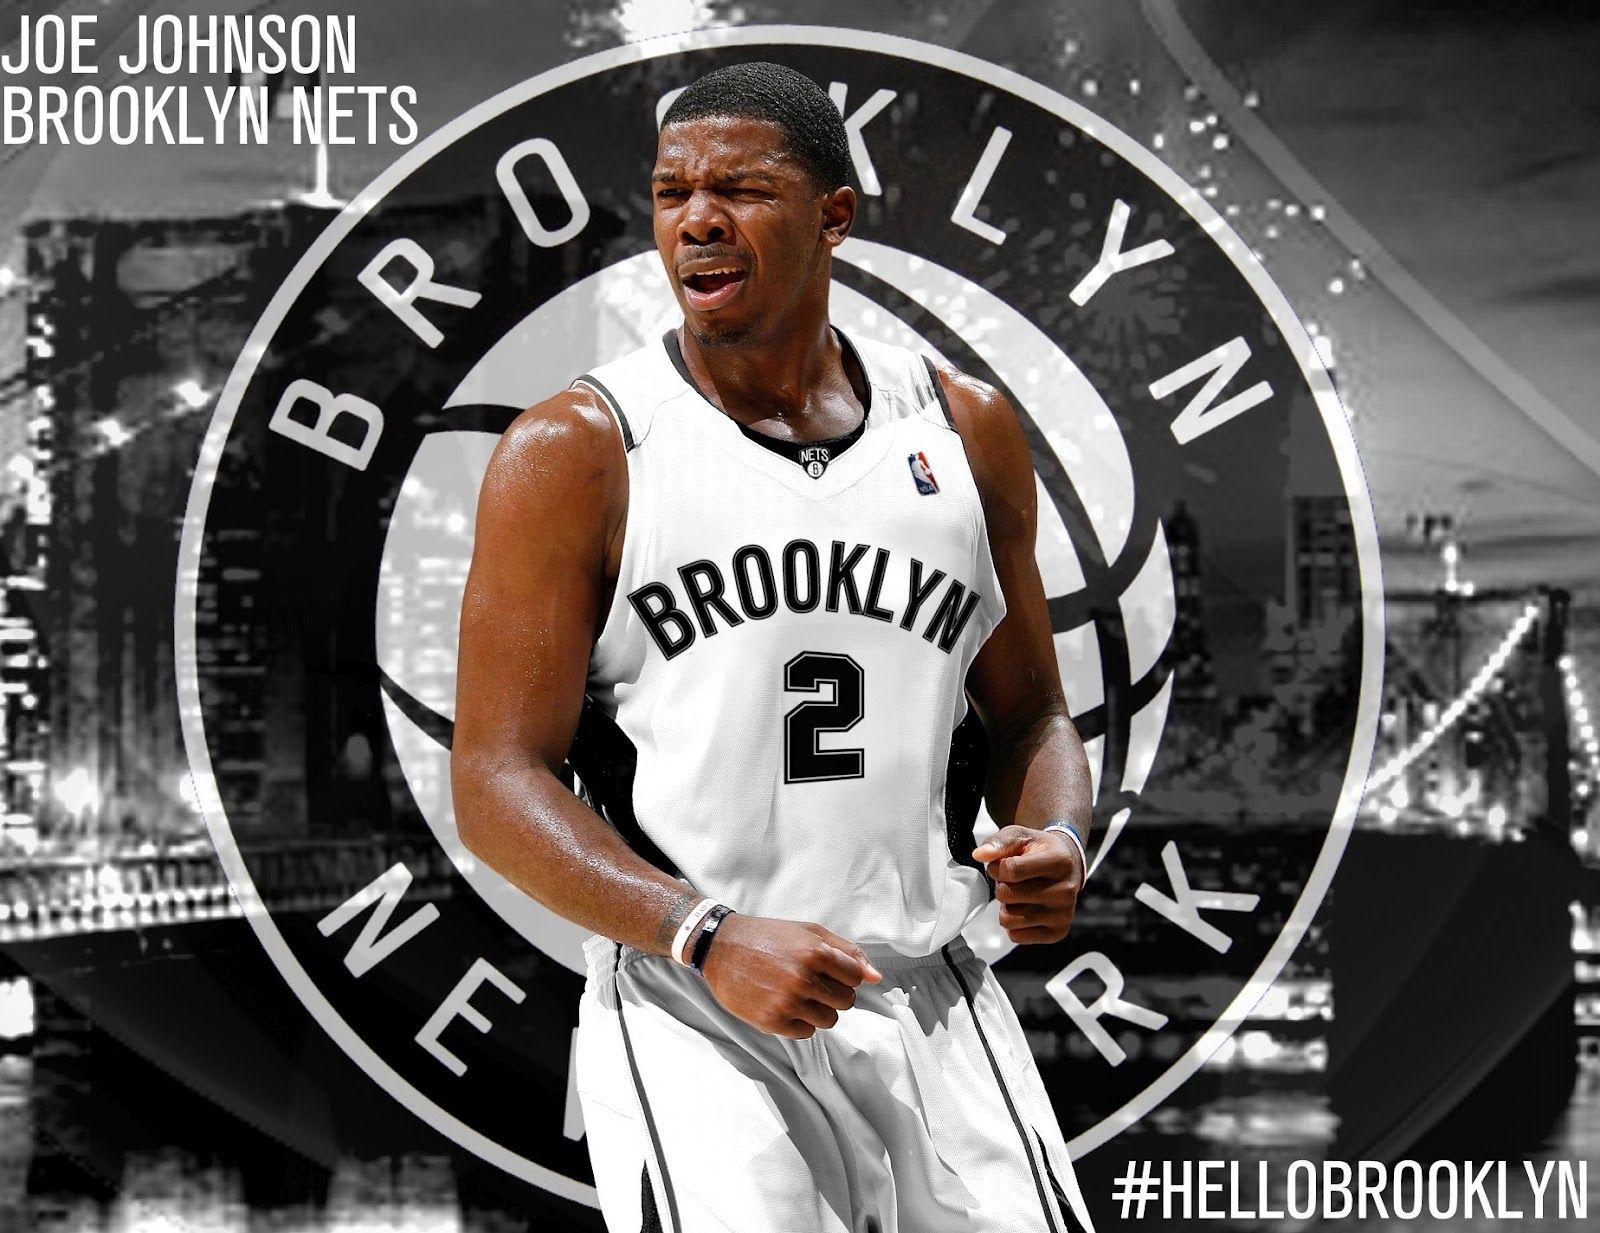 brooklyn nets | Joe+Johnson+Brooklyn+Nets.jpg